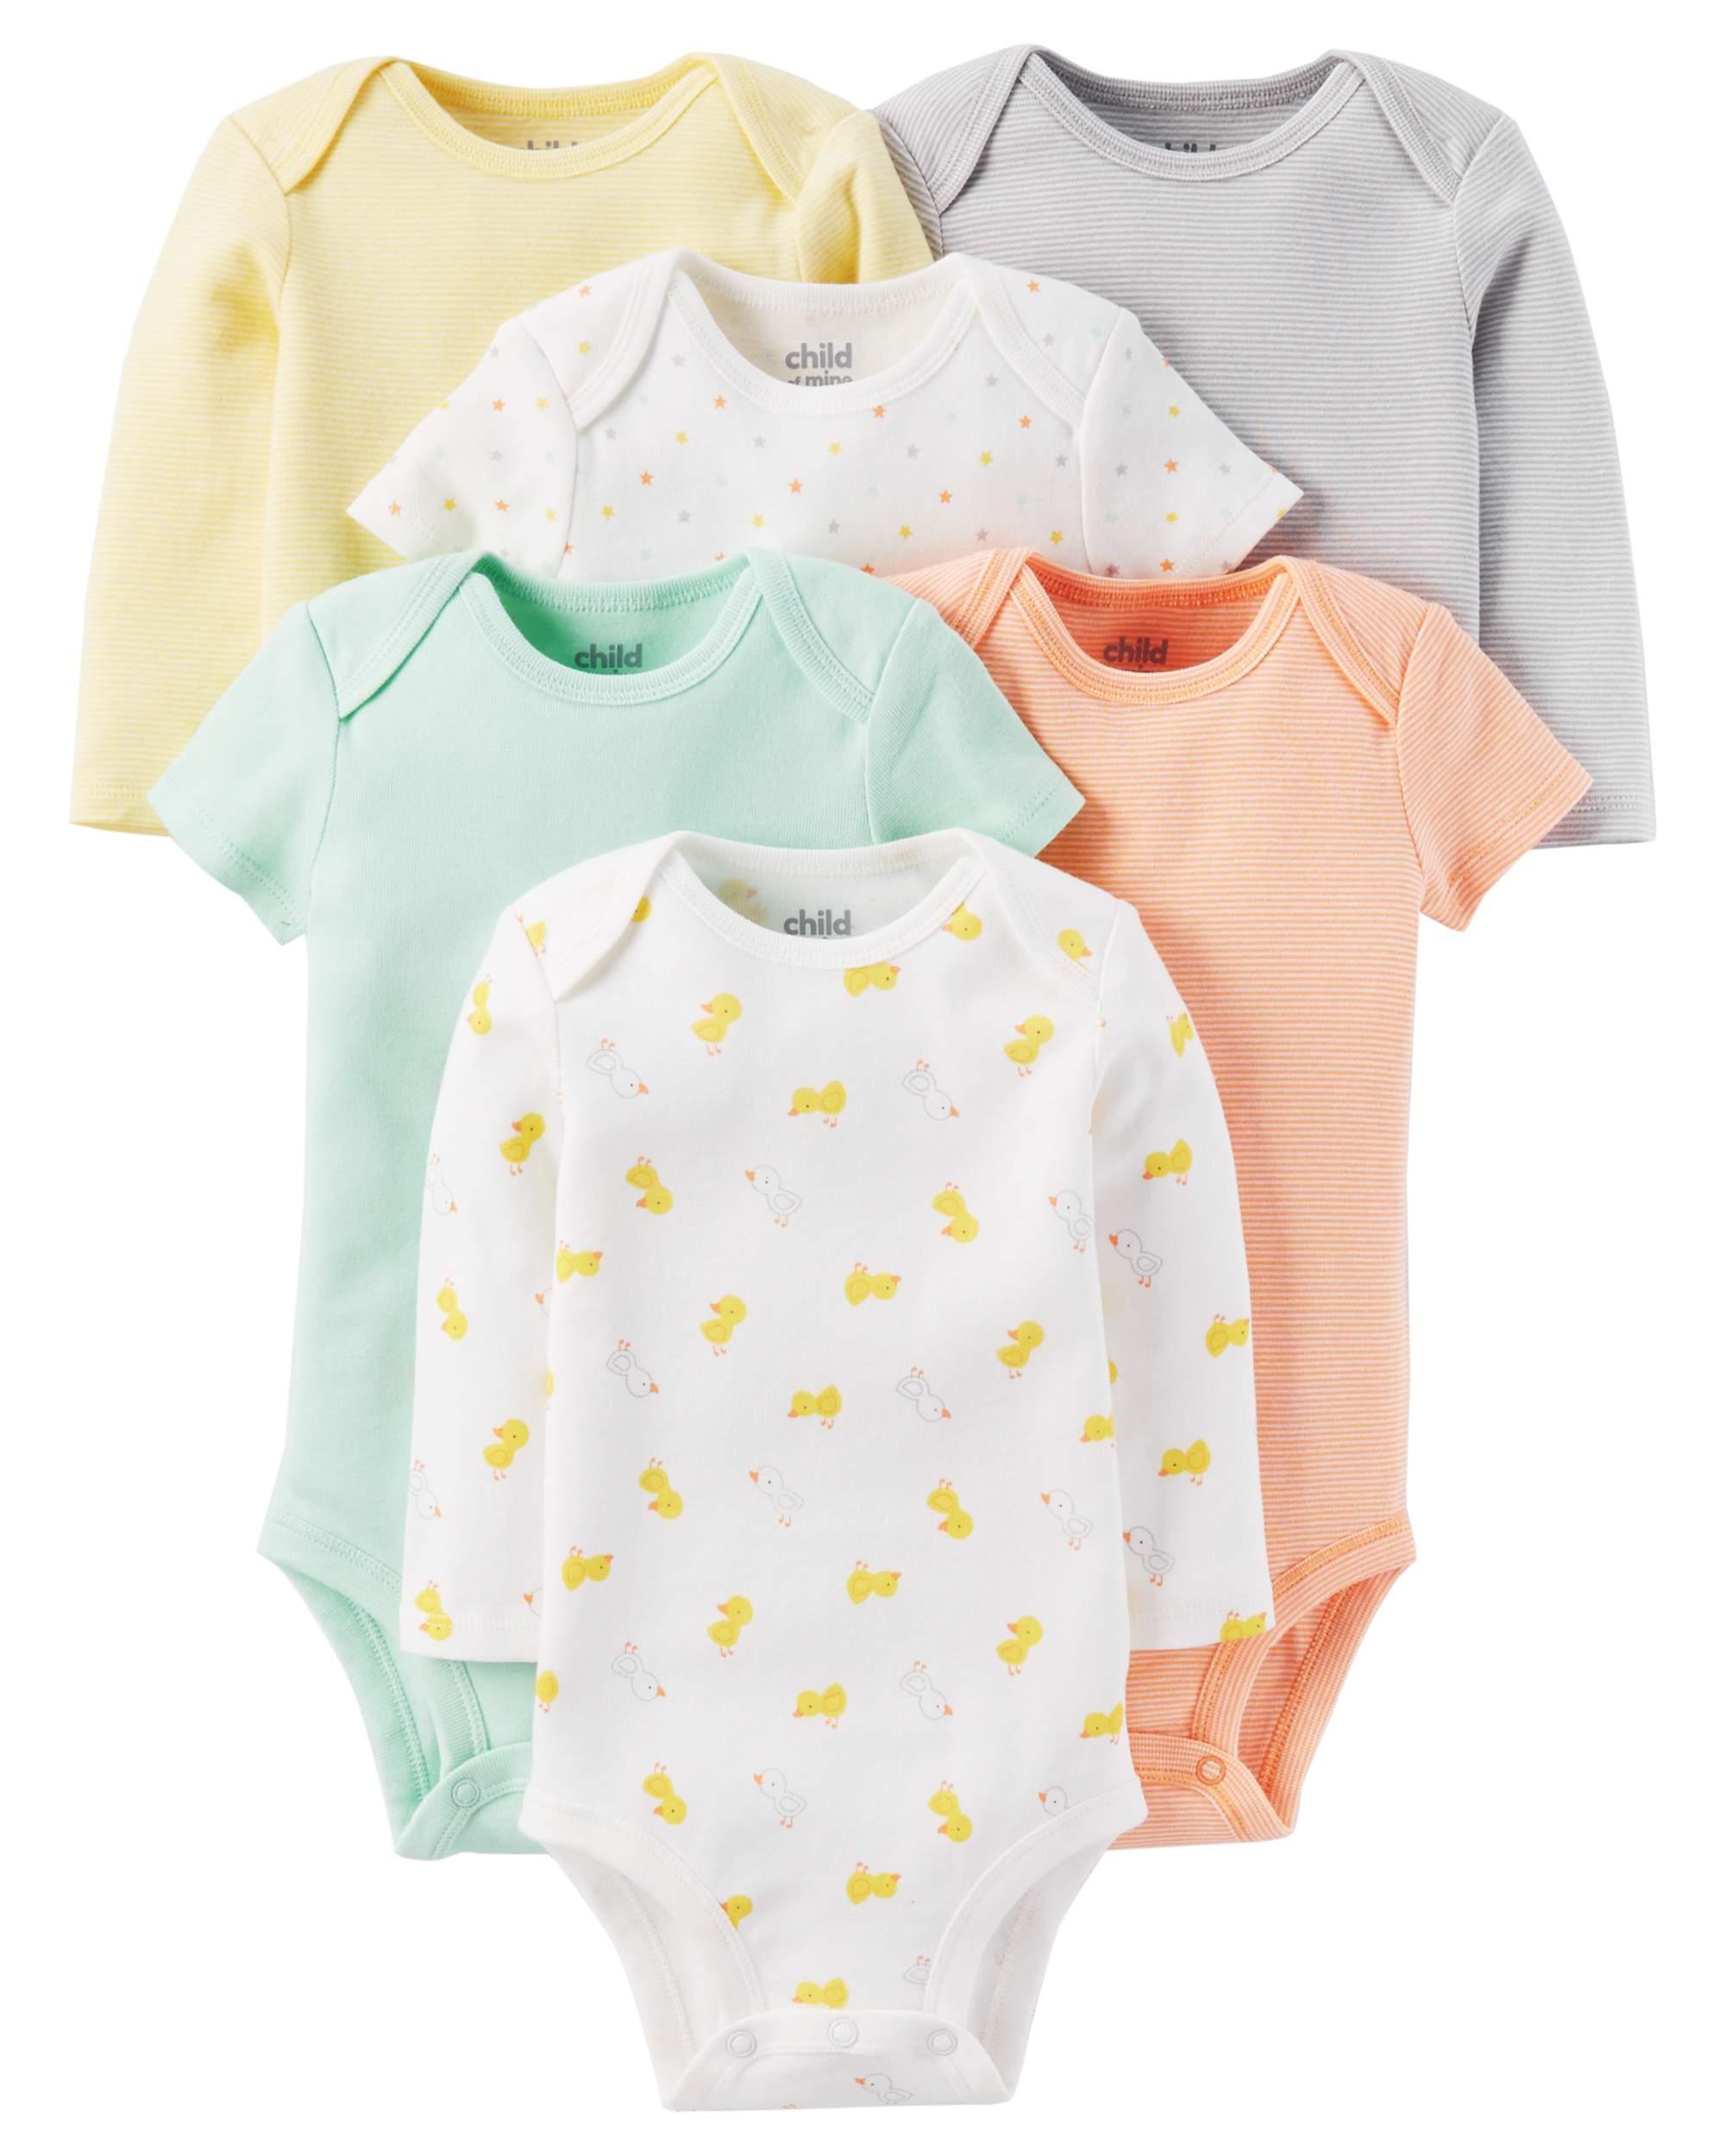 Newborn Baby Neutral Short and Longsleeve Bodysuit Set 6-Pieces